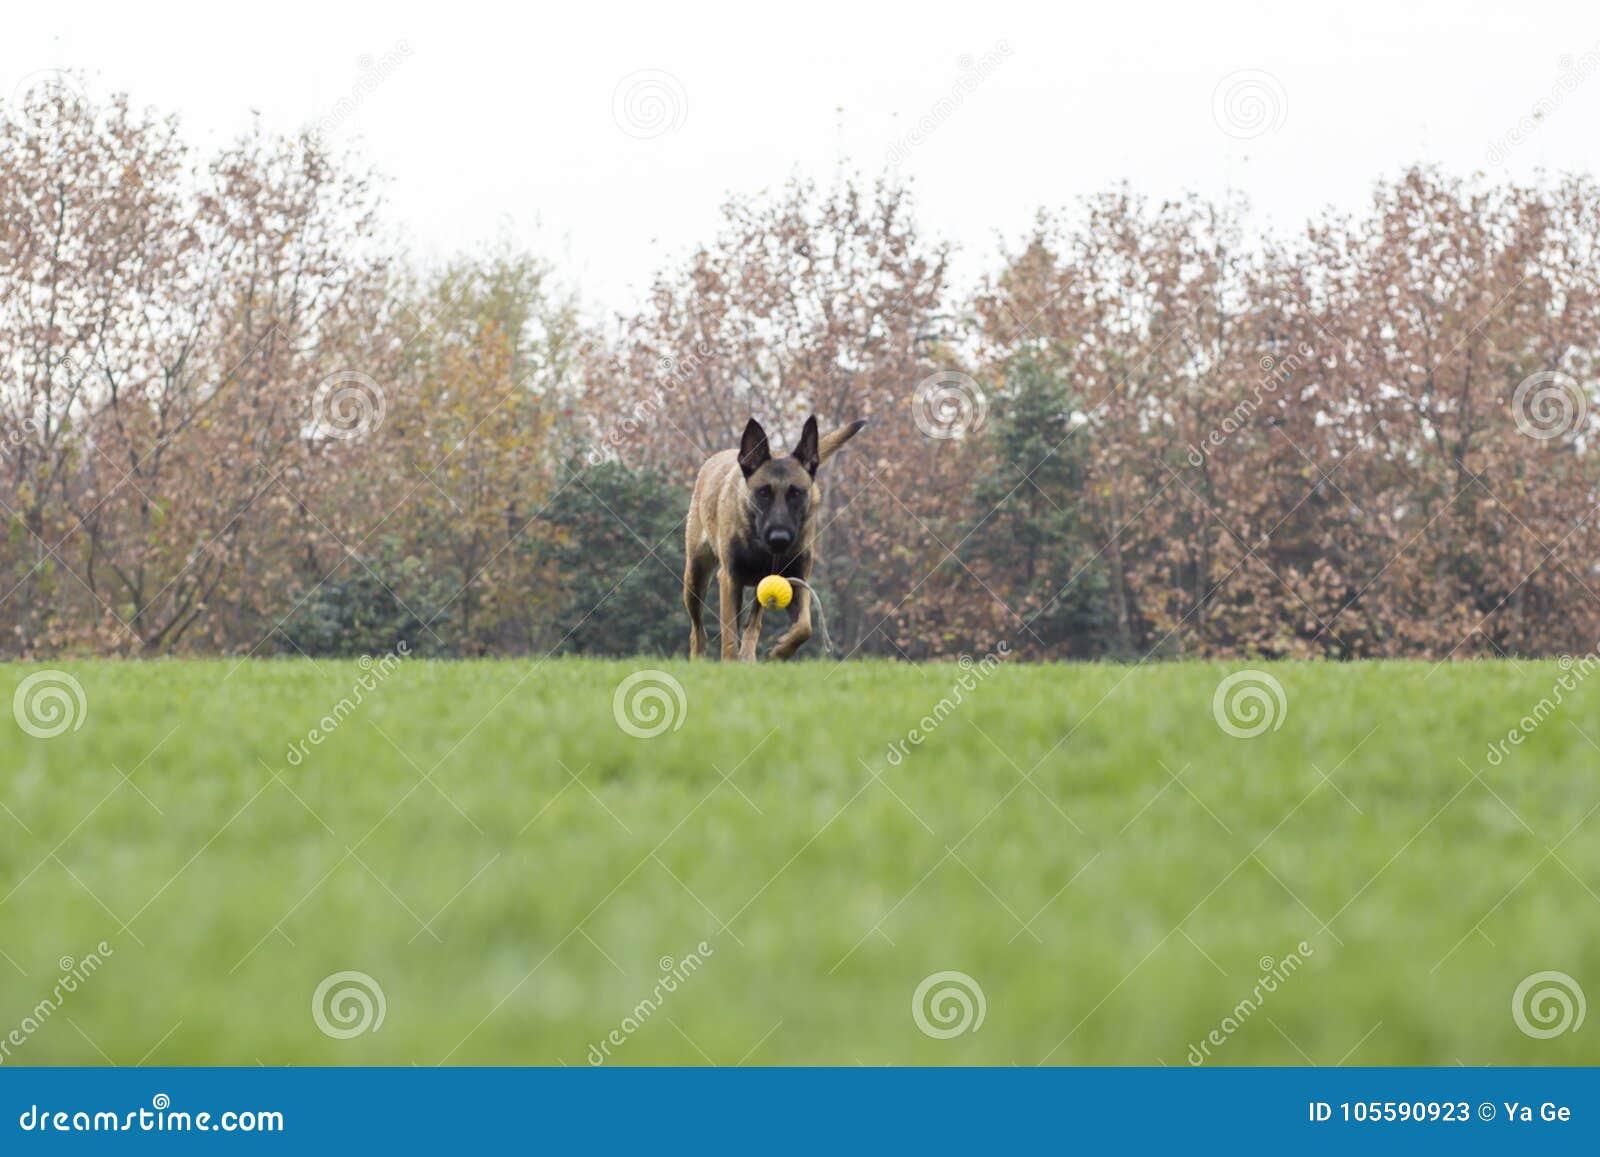 Belgian Malinois stock image. Image of dogs, grass, biting ...